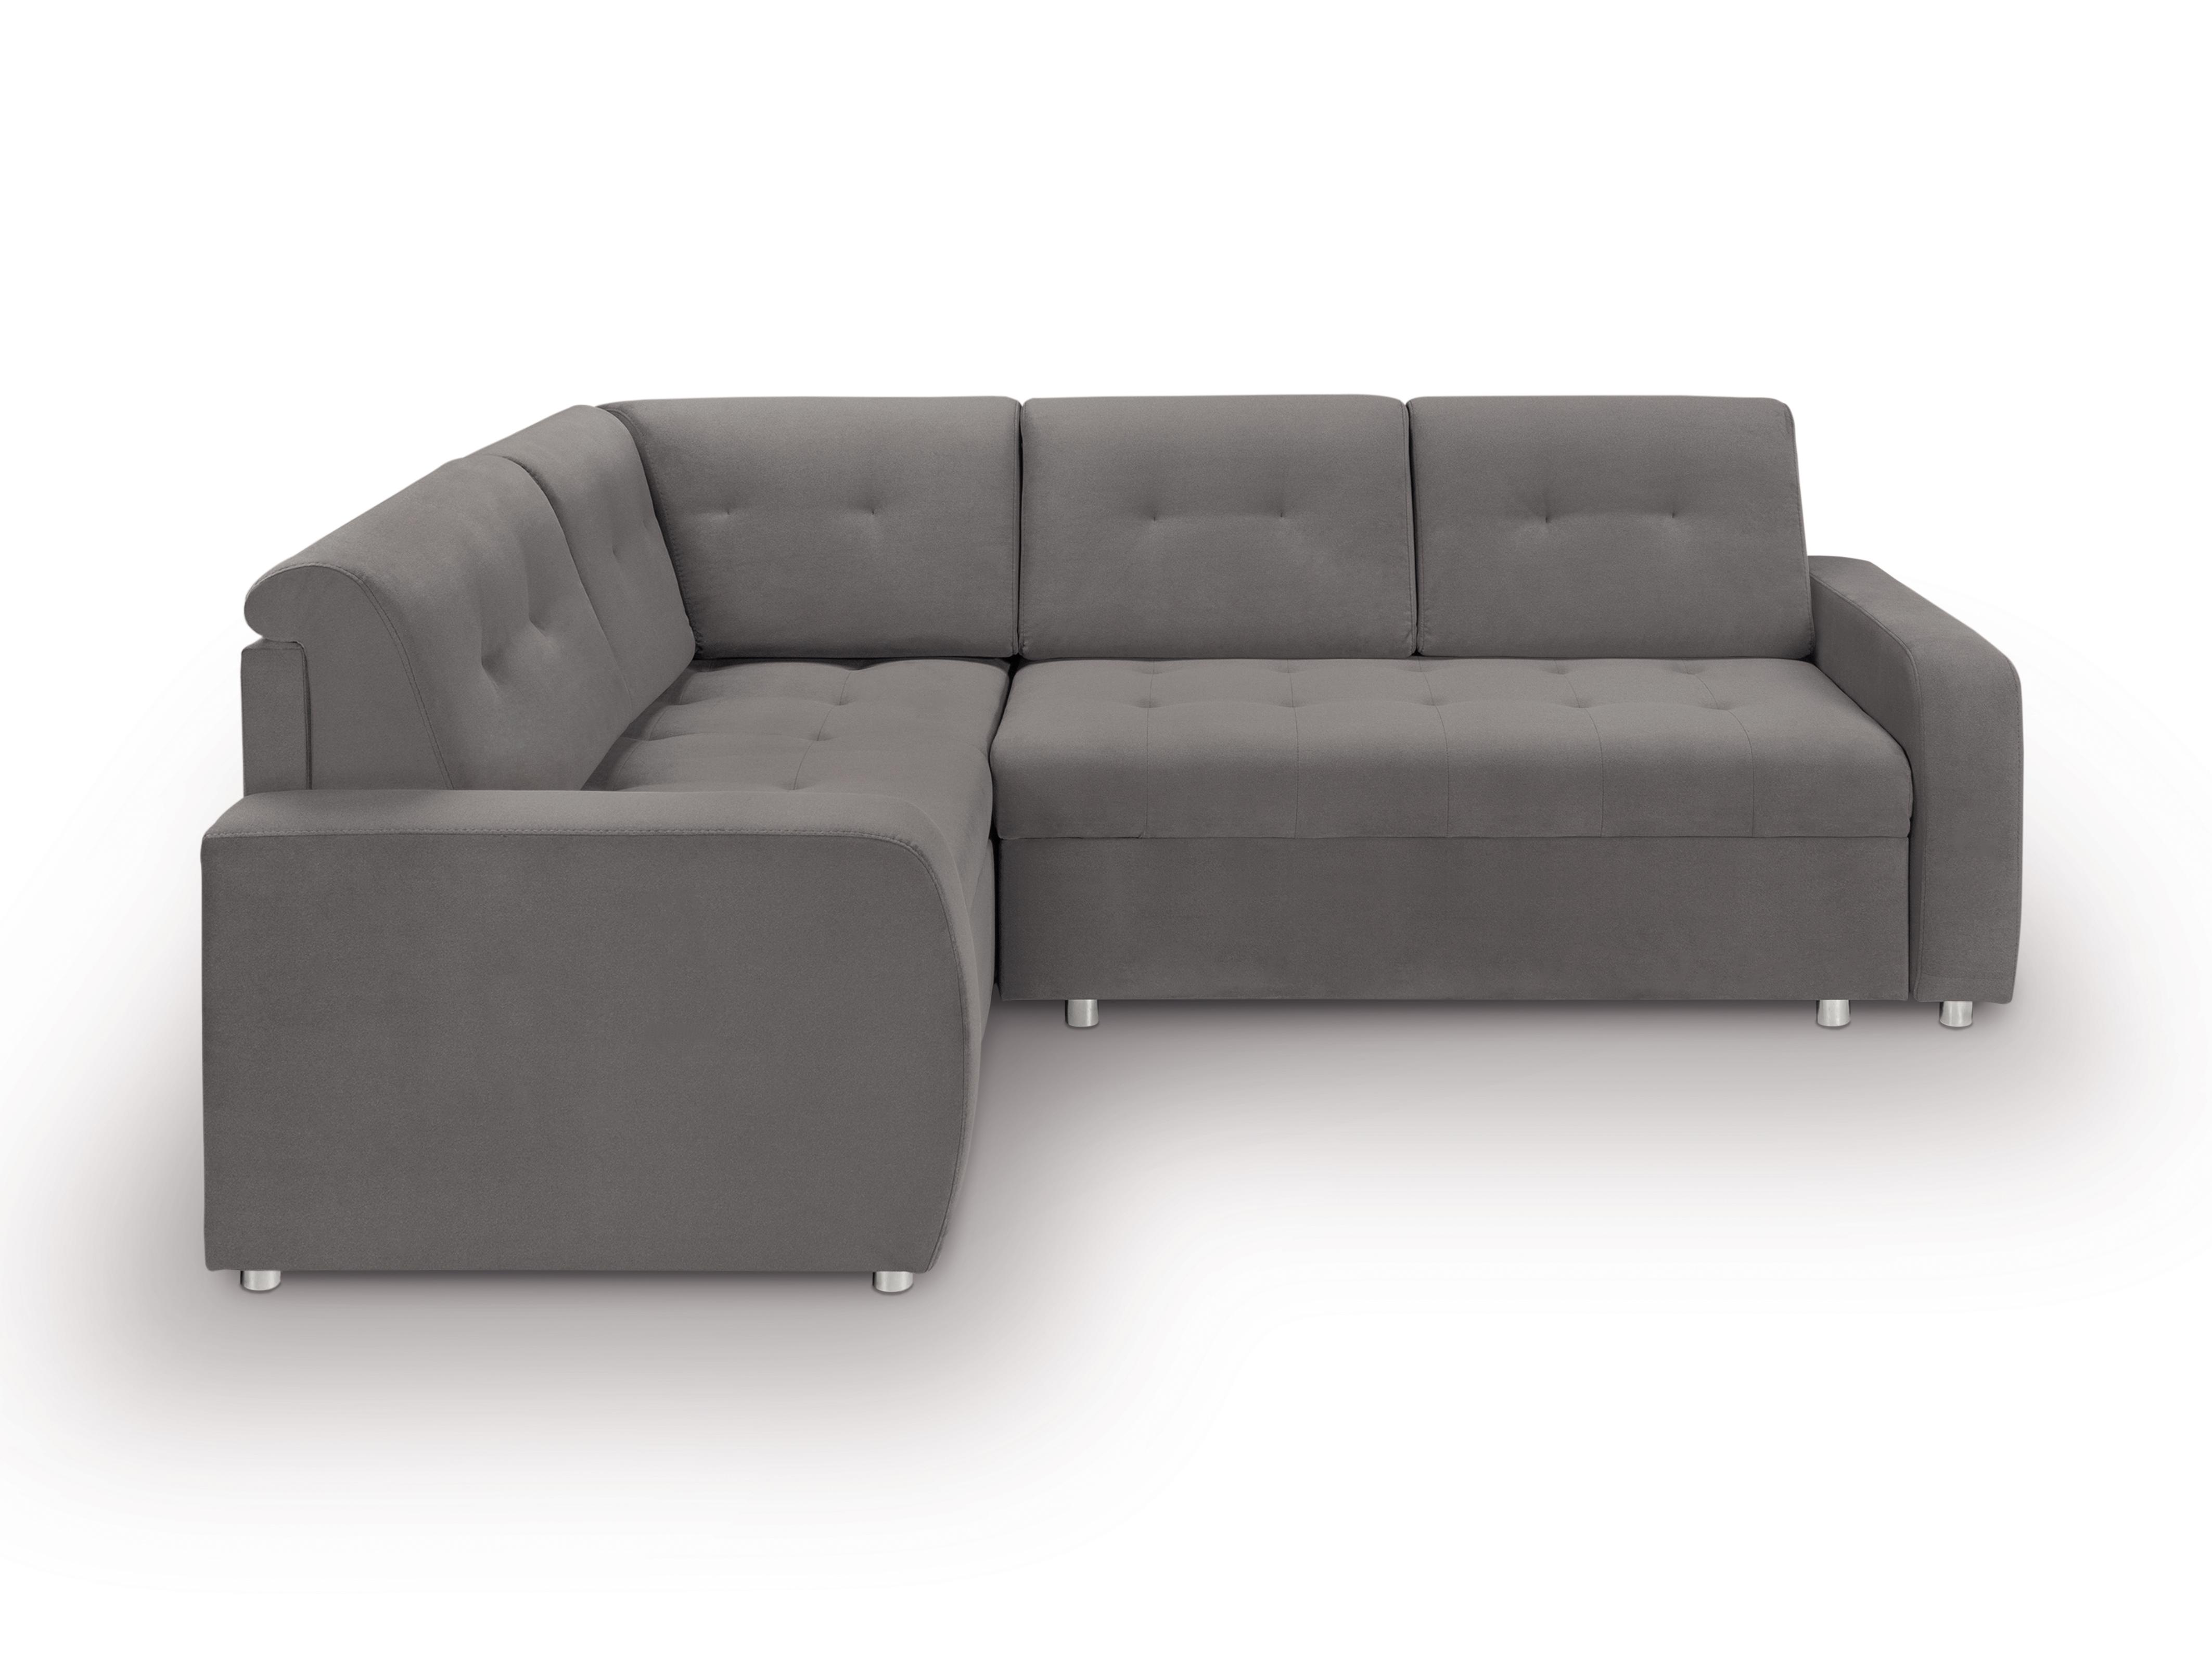 Rohová sedací souprava - BRW - Willy Lux 3DL RECBKMU (šedá) (L)